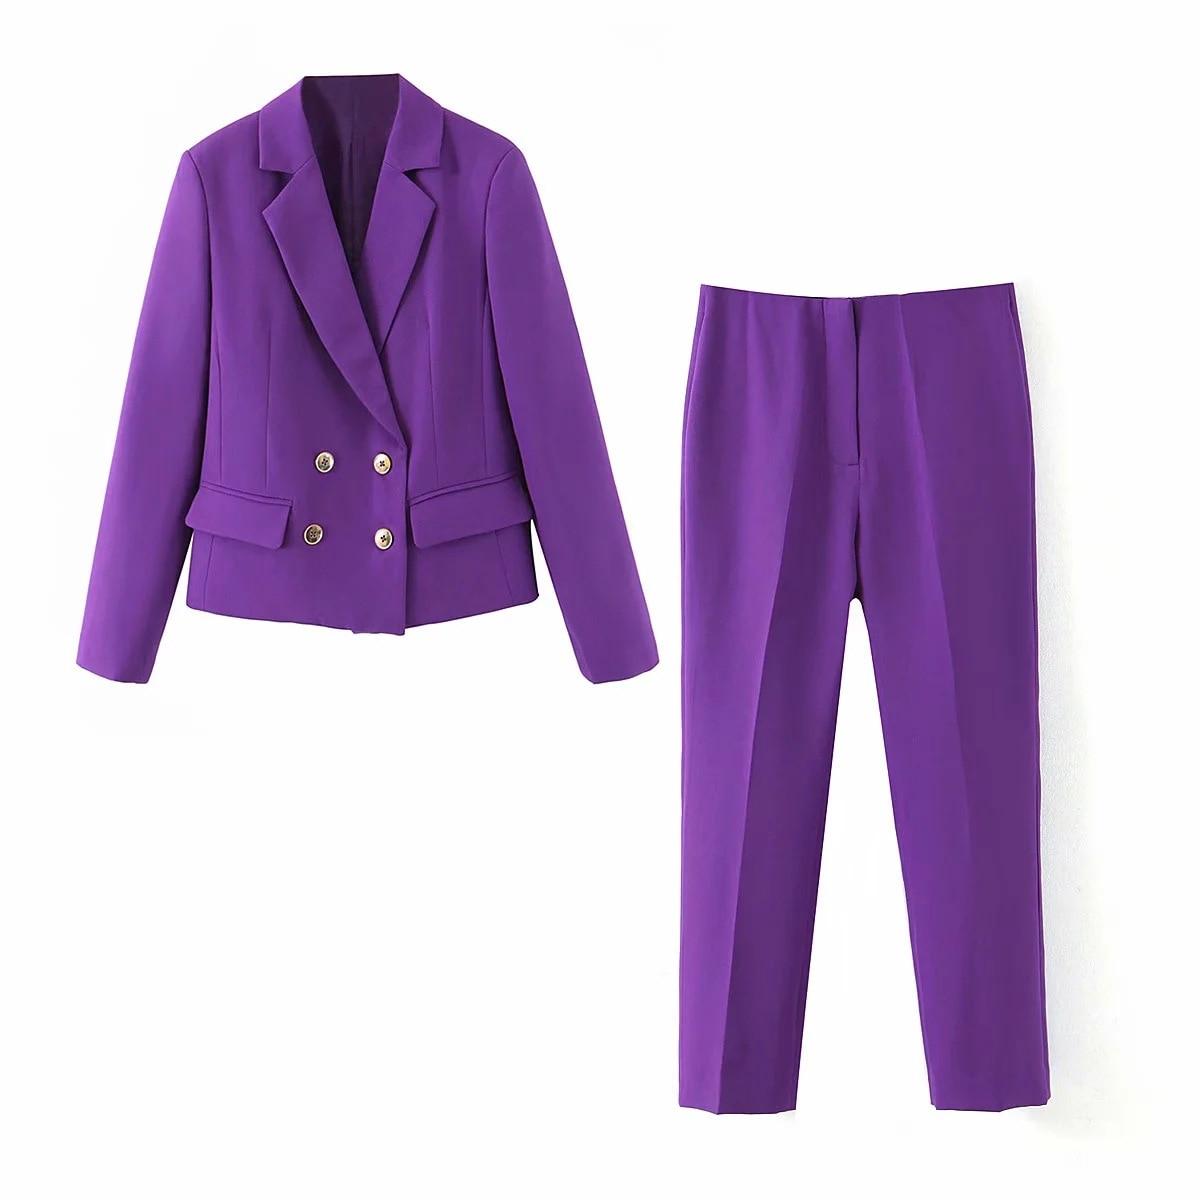 2020 Spring And Autumn New Casual Women's Suit Pants Two-piece Fashion Purple Short Ladies Blazer Elegant Trousers